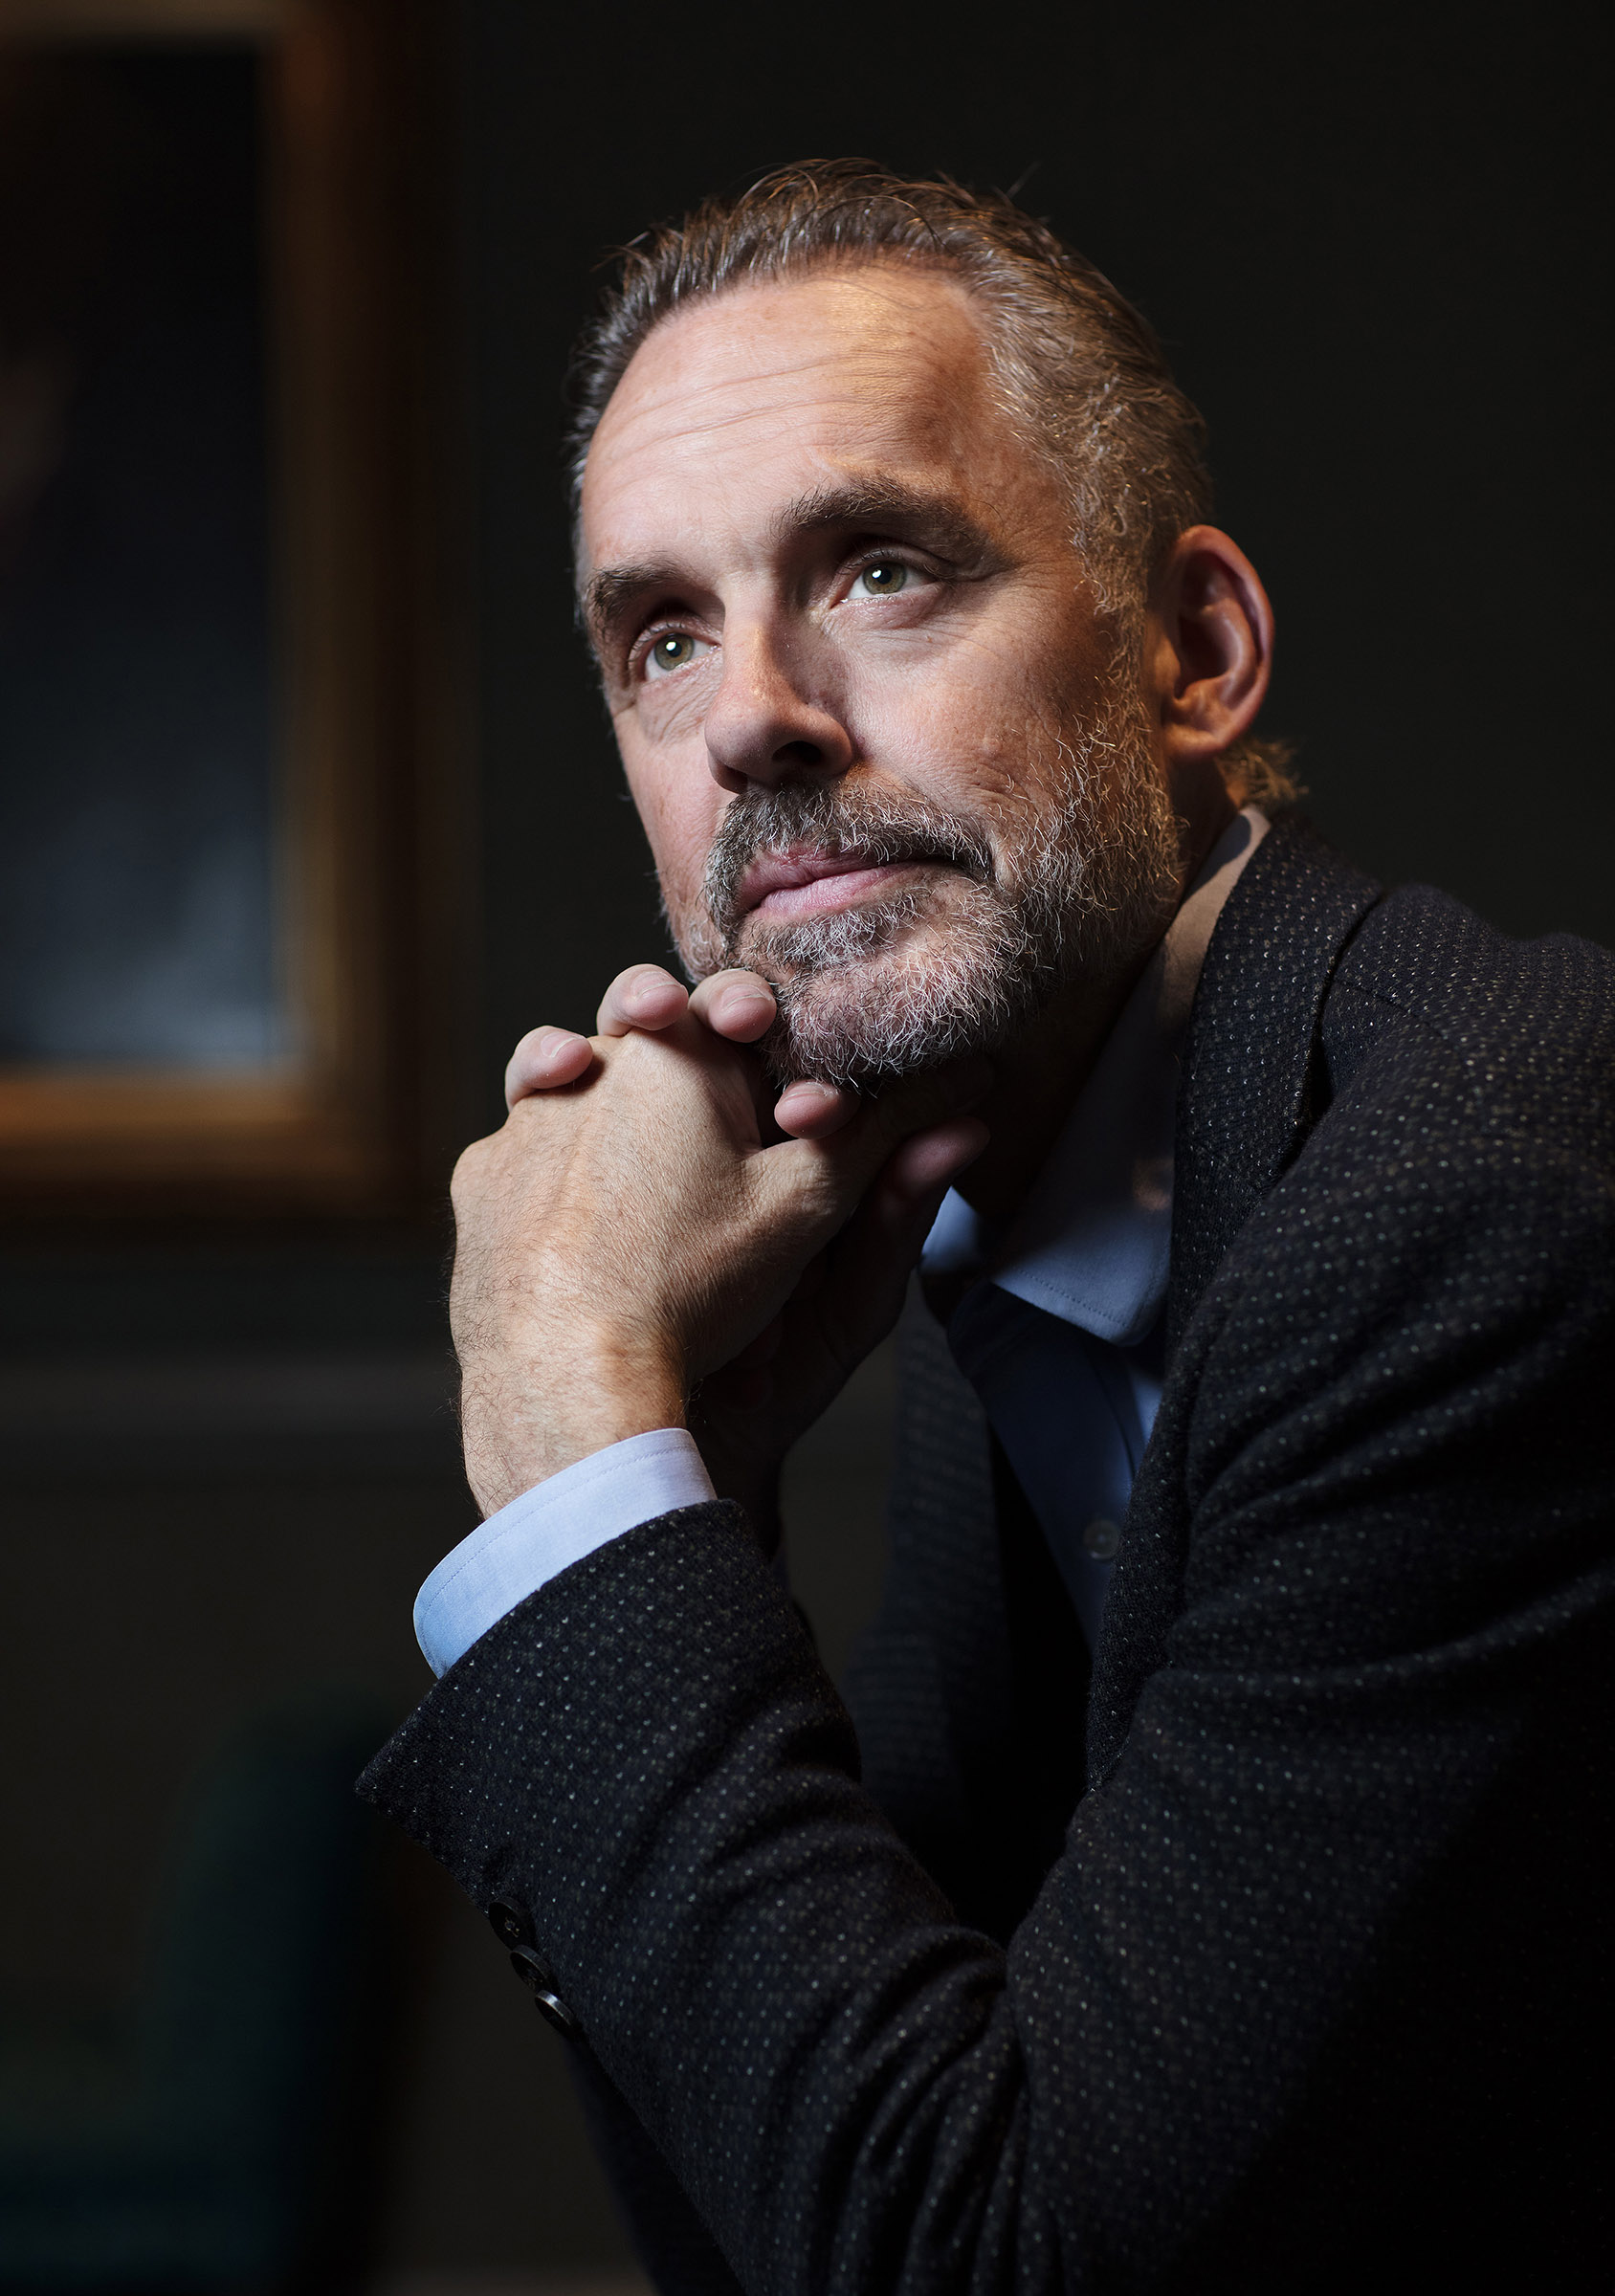 Jordan Peterson for Der Spiegel